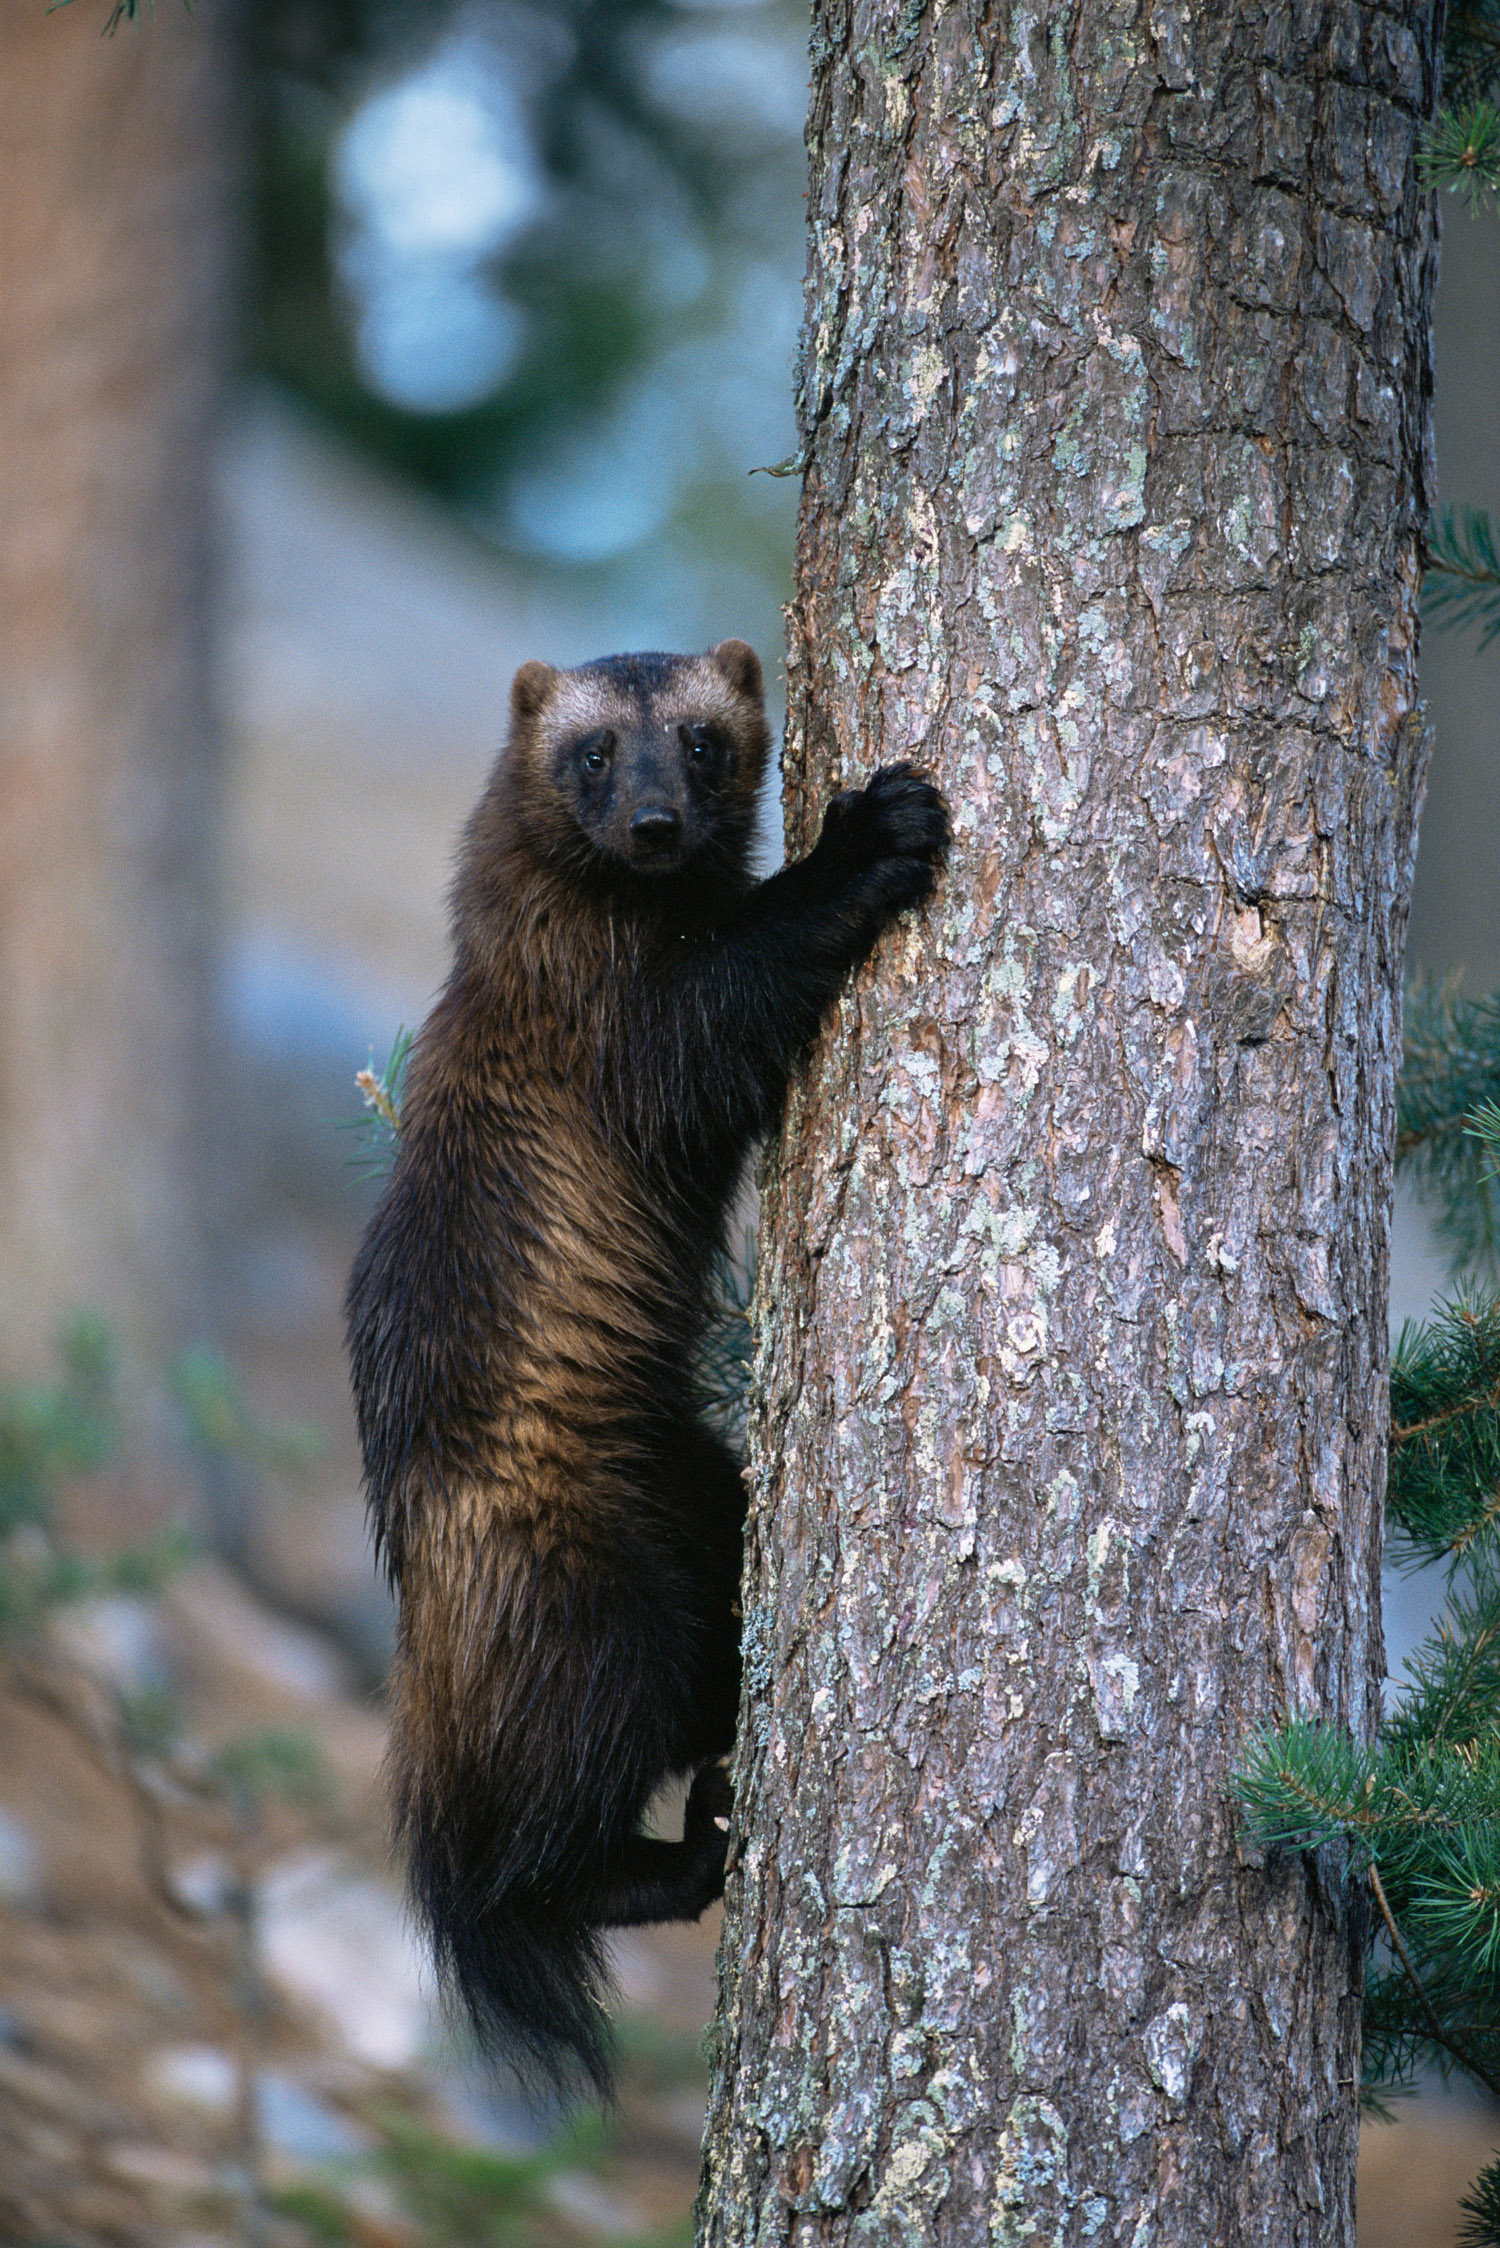 Wolverine climbing tree, Lieska, Finland